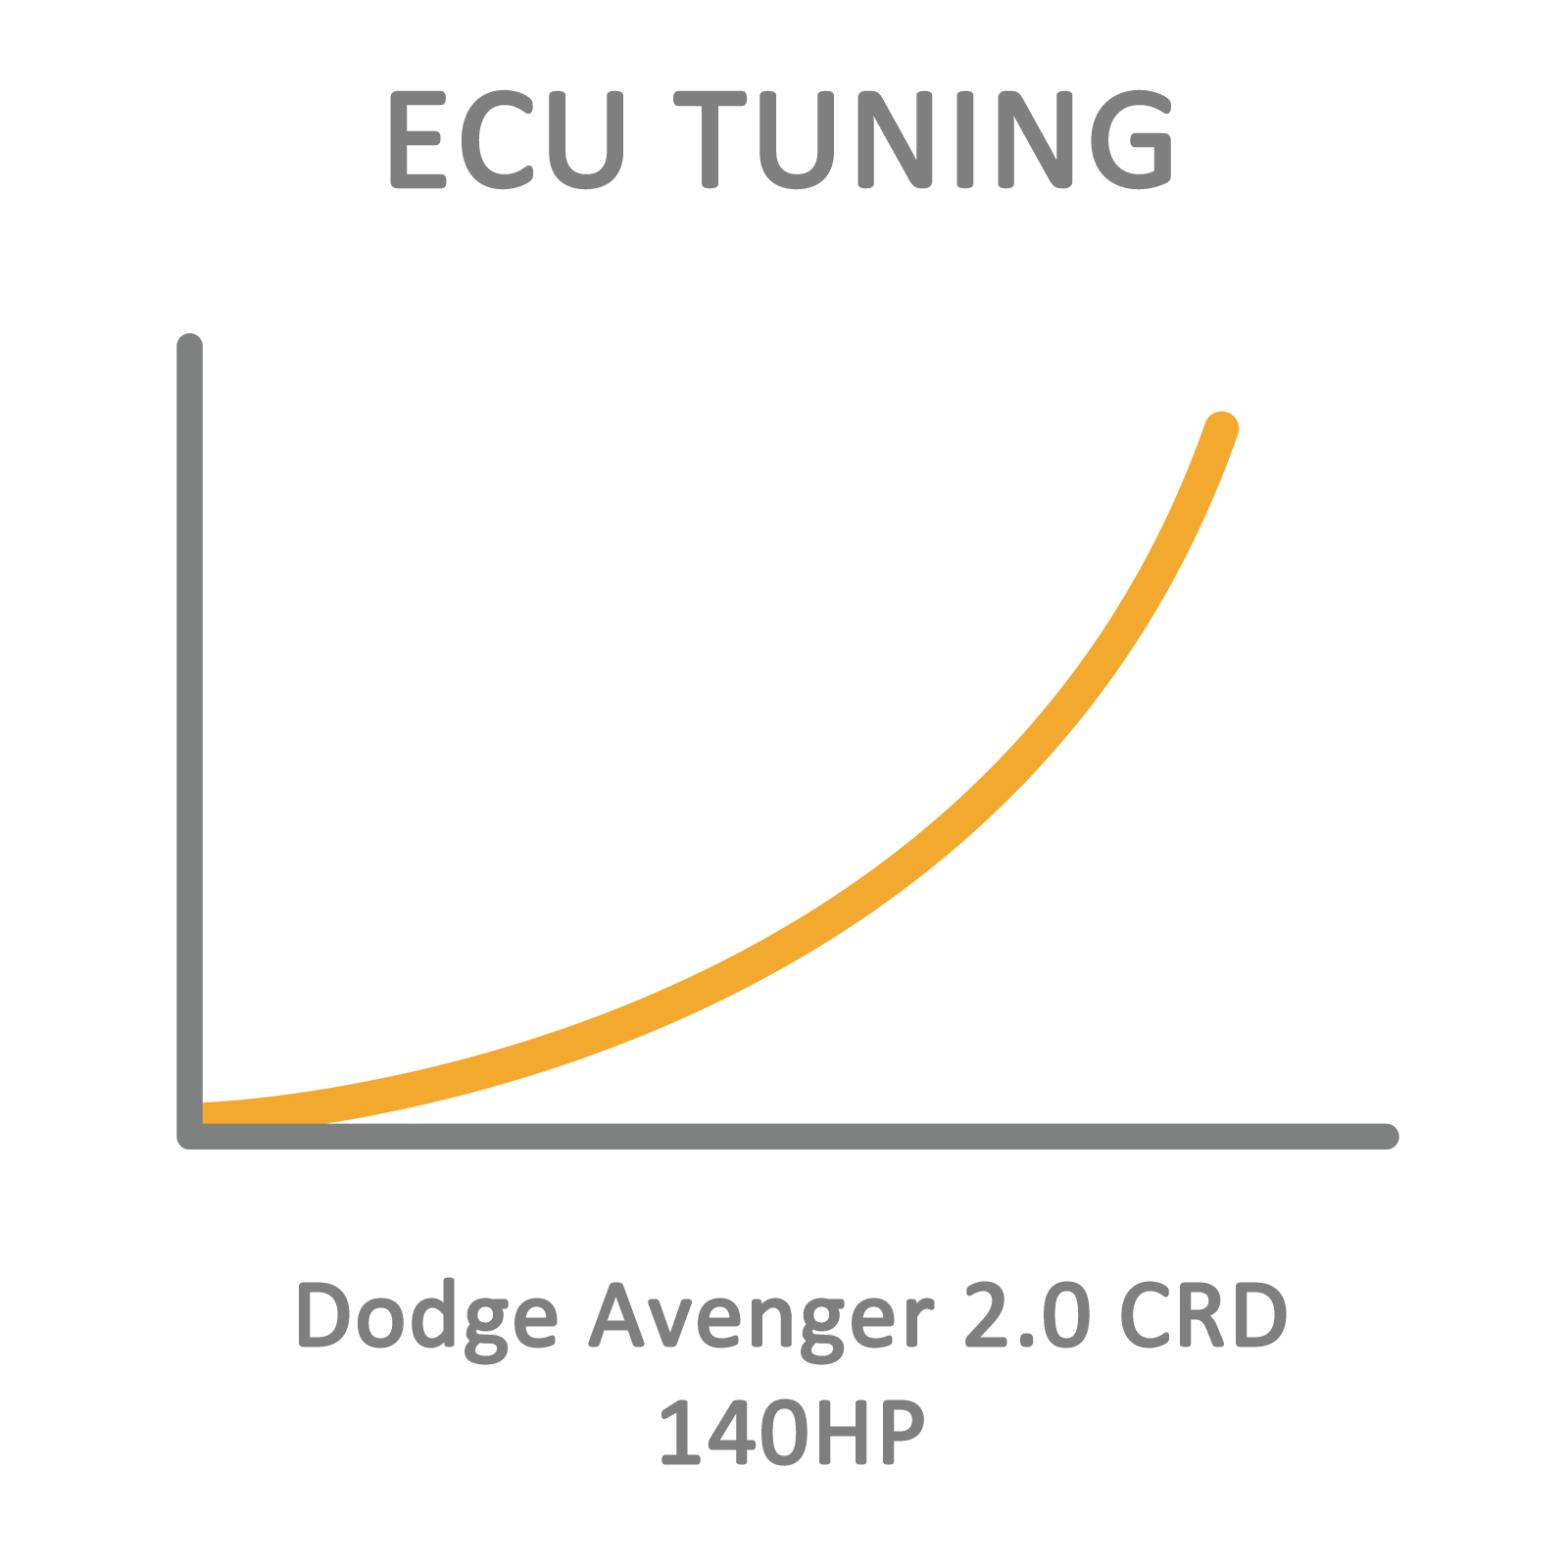 Dodge Avenger 2.0 CRD 140HP ECU Tuning Remapping Programming